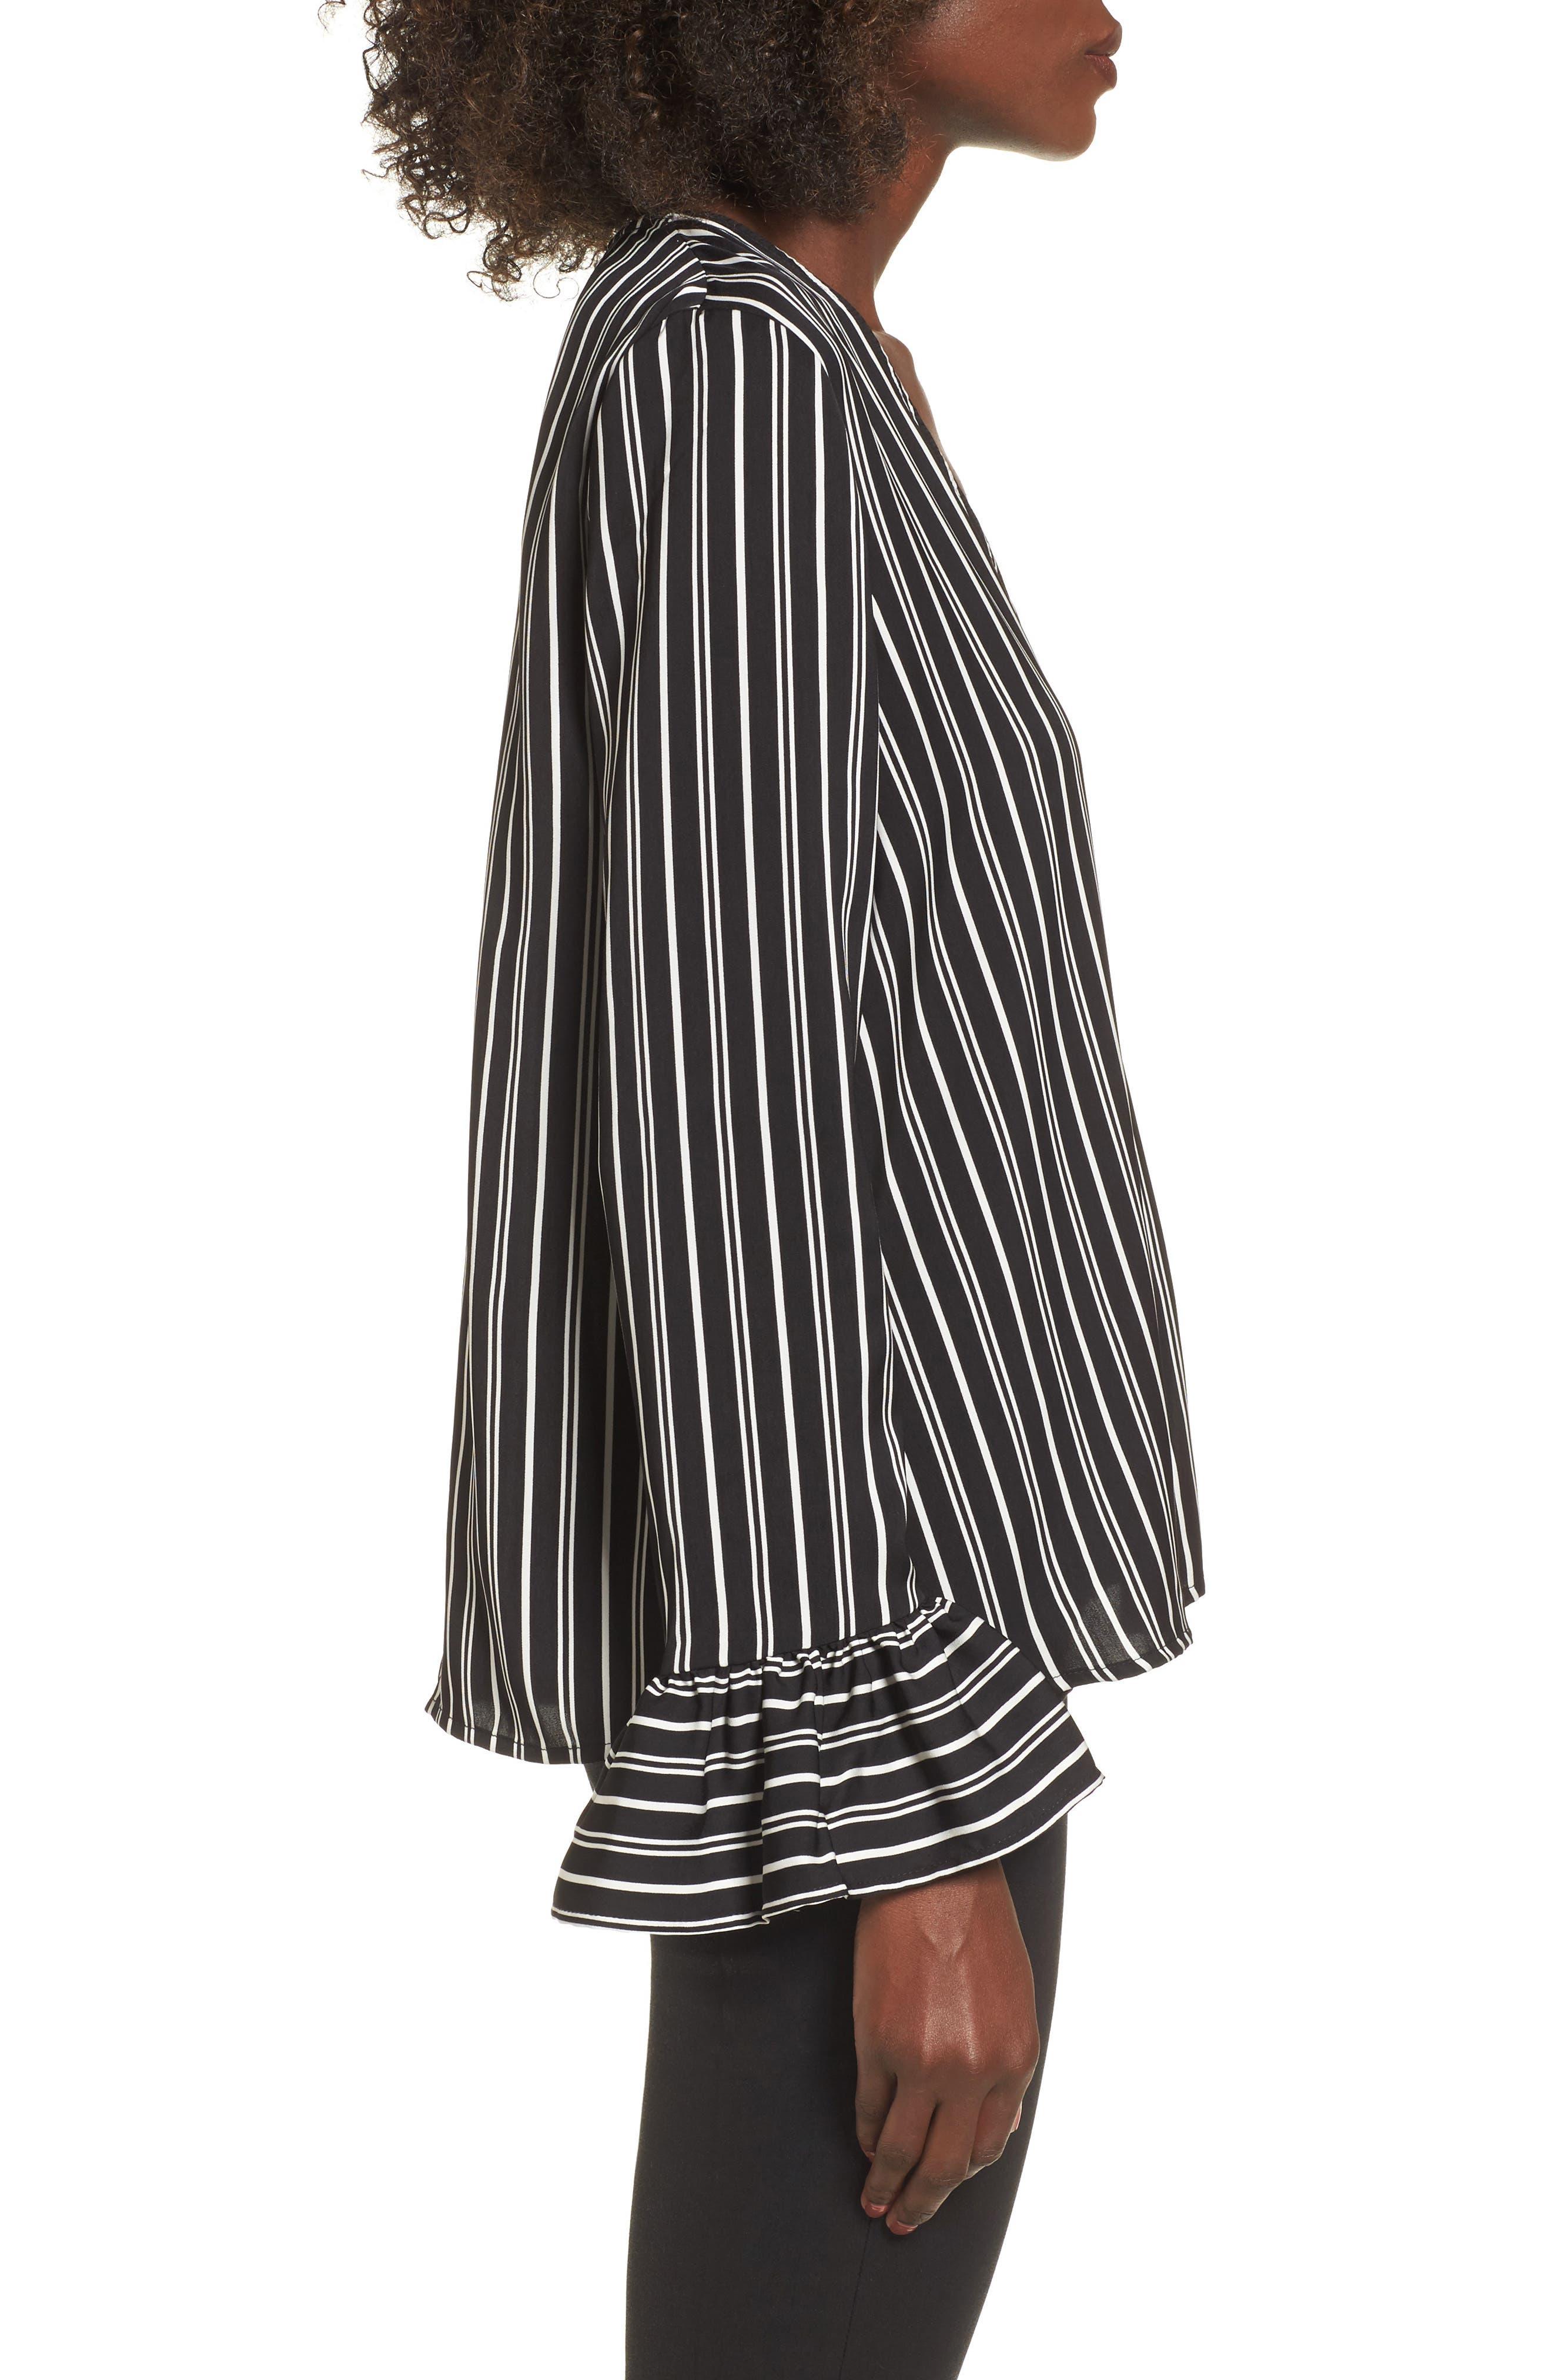 Ophelia Stripe Flare Cuff Top,                             Alternate thumbnail 3, color,                             Black W/ Ivory